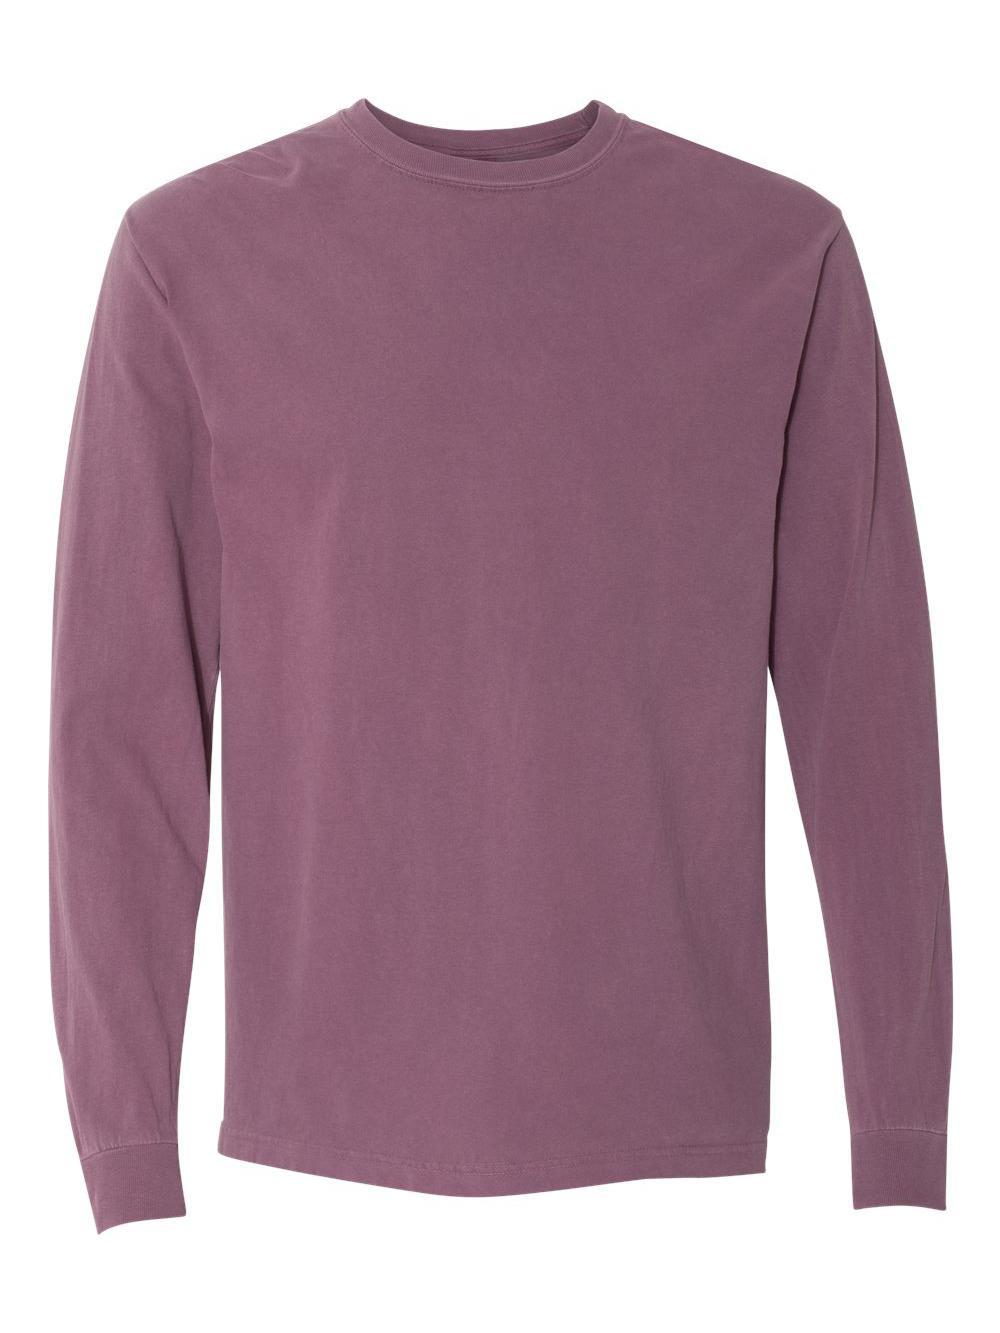 Comfort-Colors-Garment-Dyed-Heavyweight-Ringspun-Long-Sleeve-T-Shirt-6014 thumbnail 3